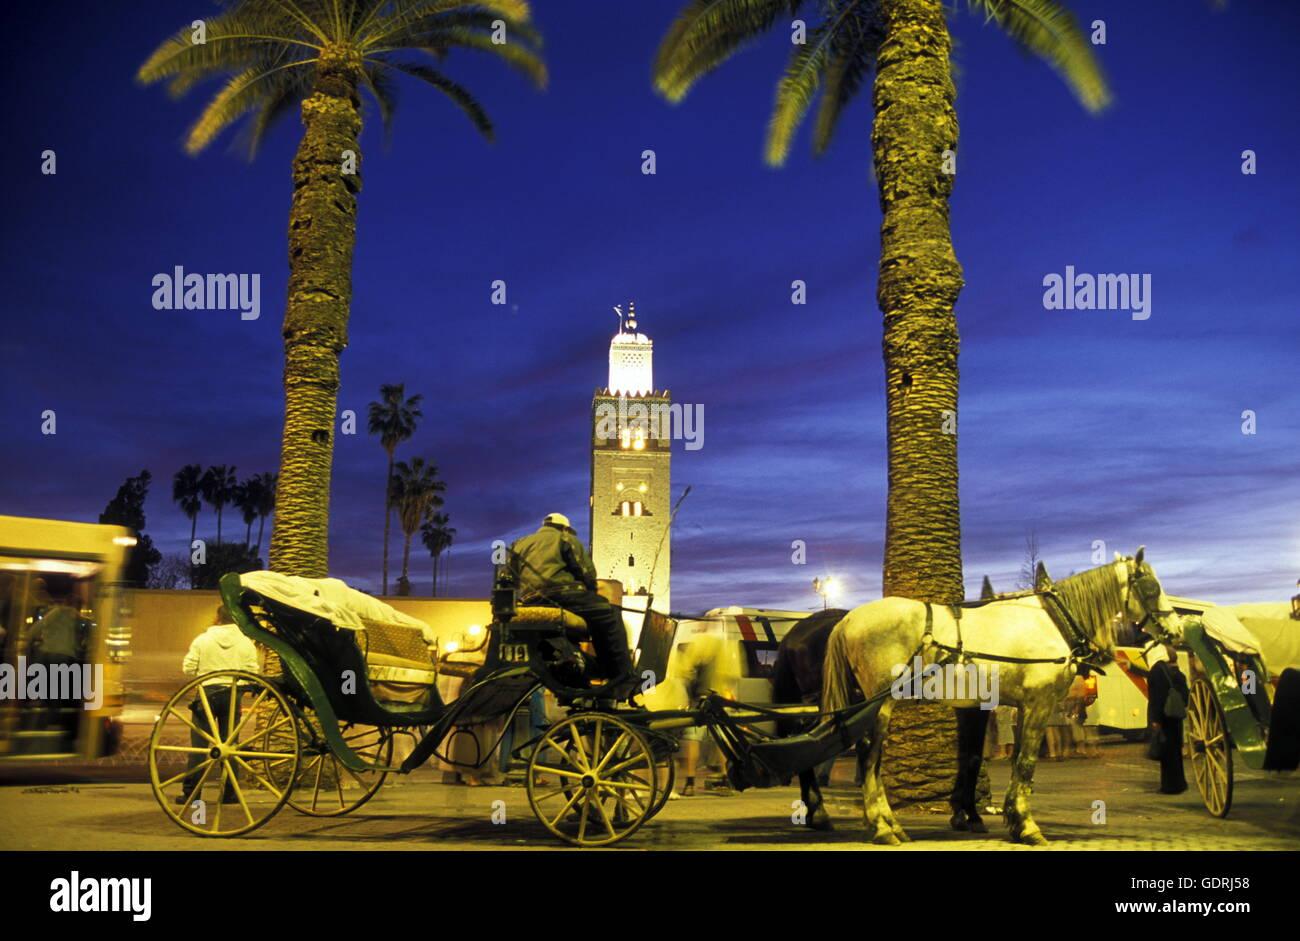 Die Koutoubia Moschee am Djemma el Fna Platz in der Altstadt von Marrakesh in Marokko in Nordafrika. - Stock Image